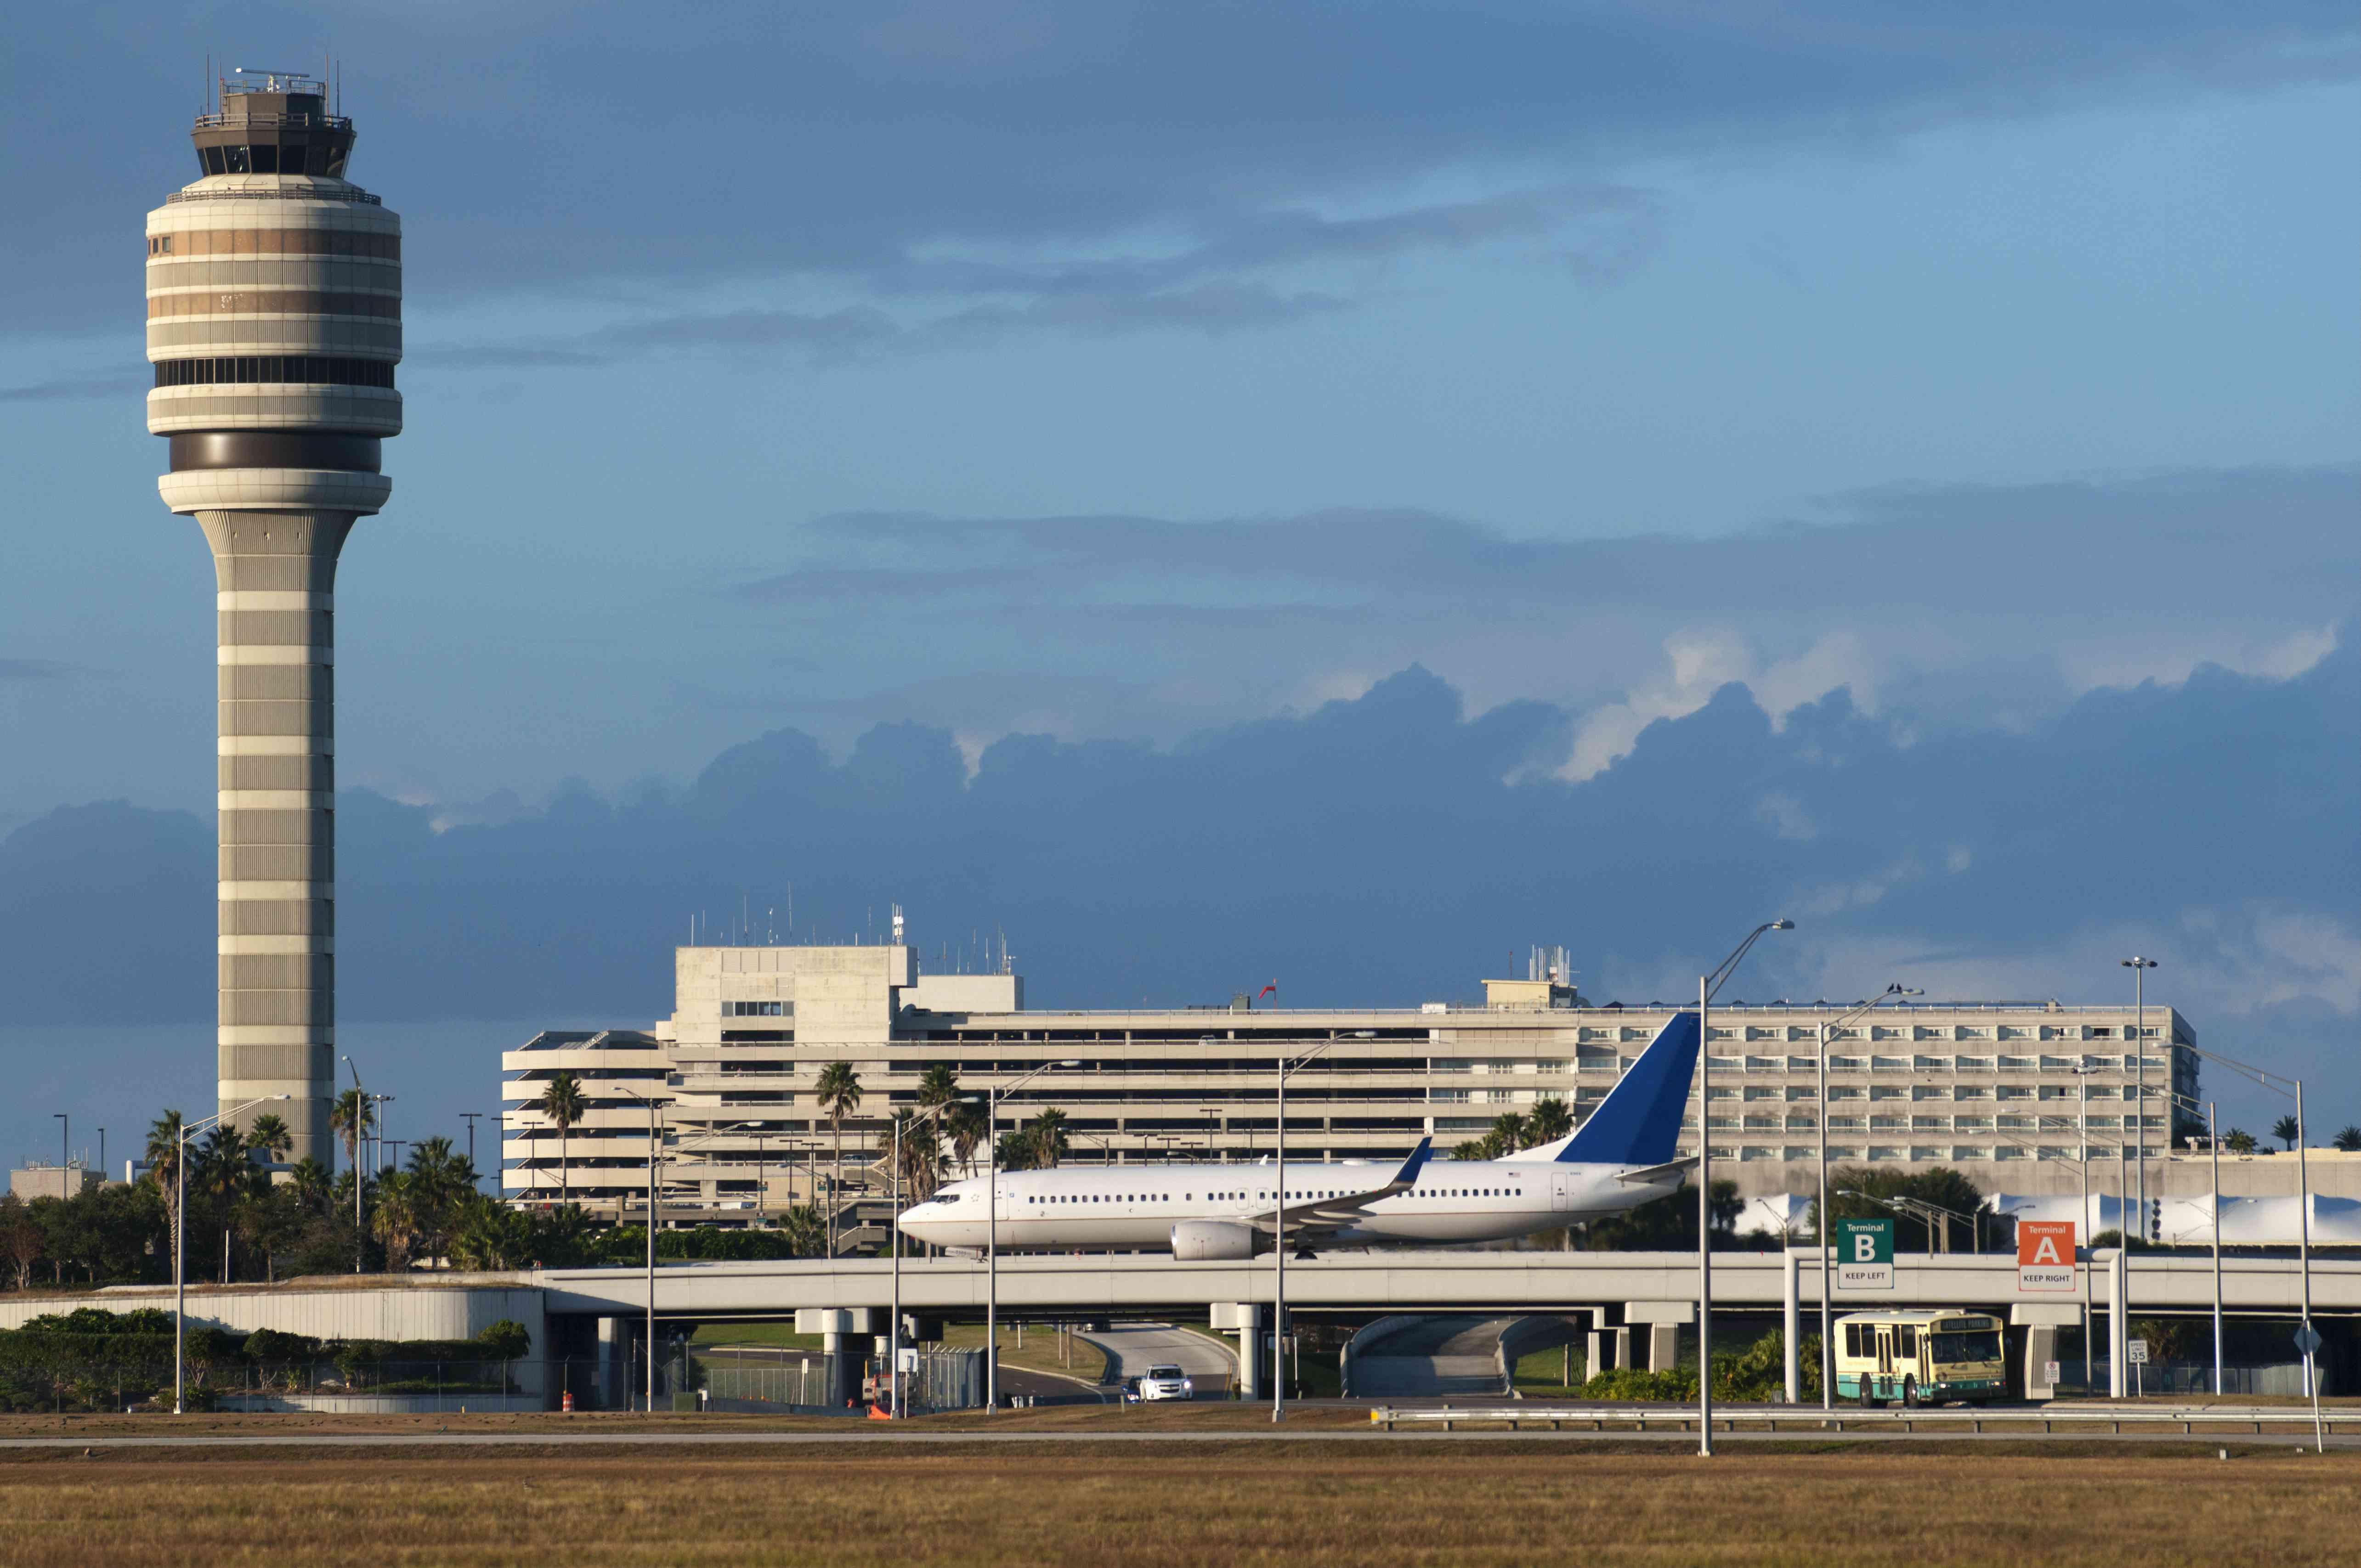 Control tower at Orlando International Airport.